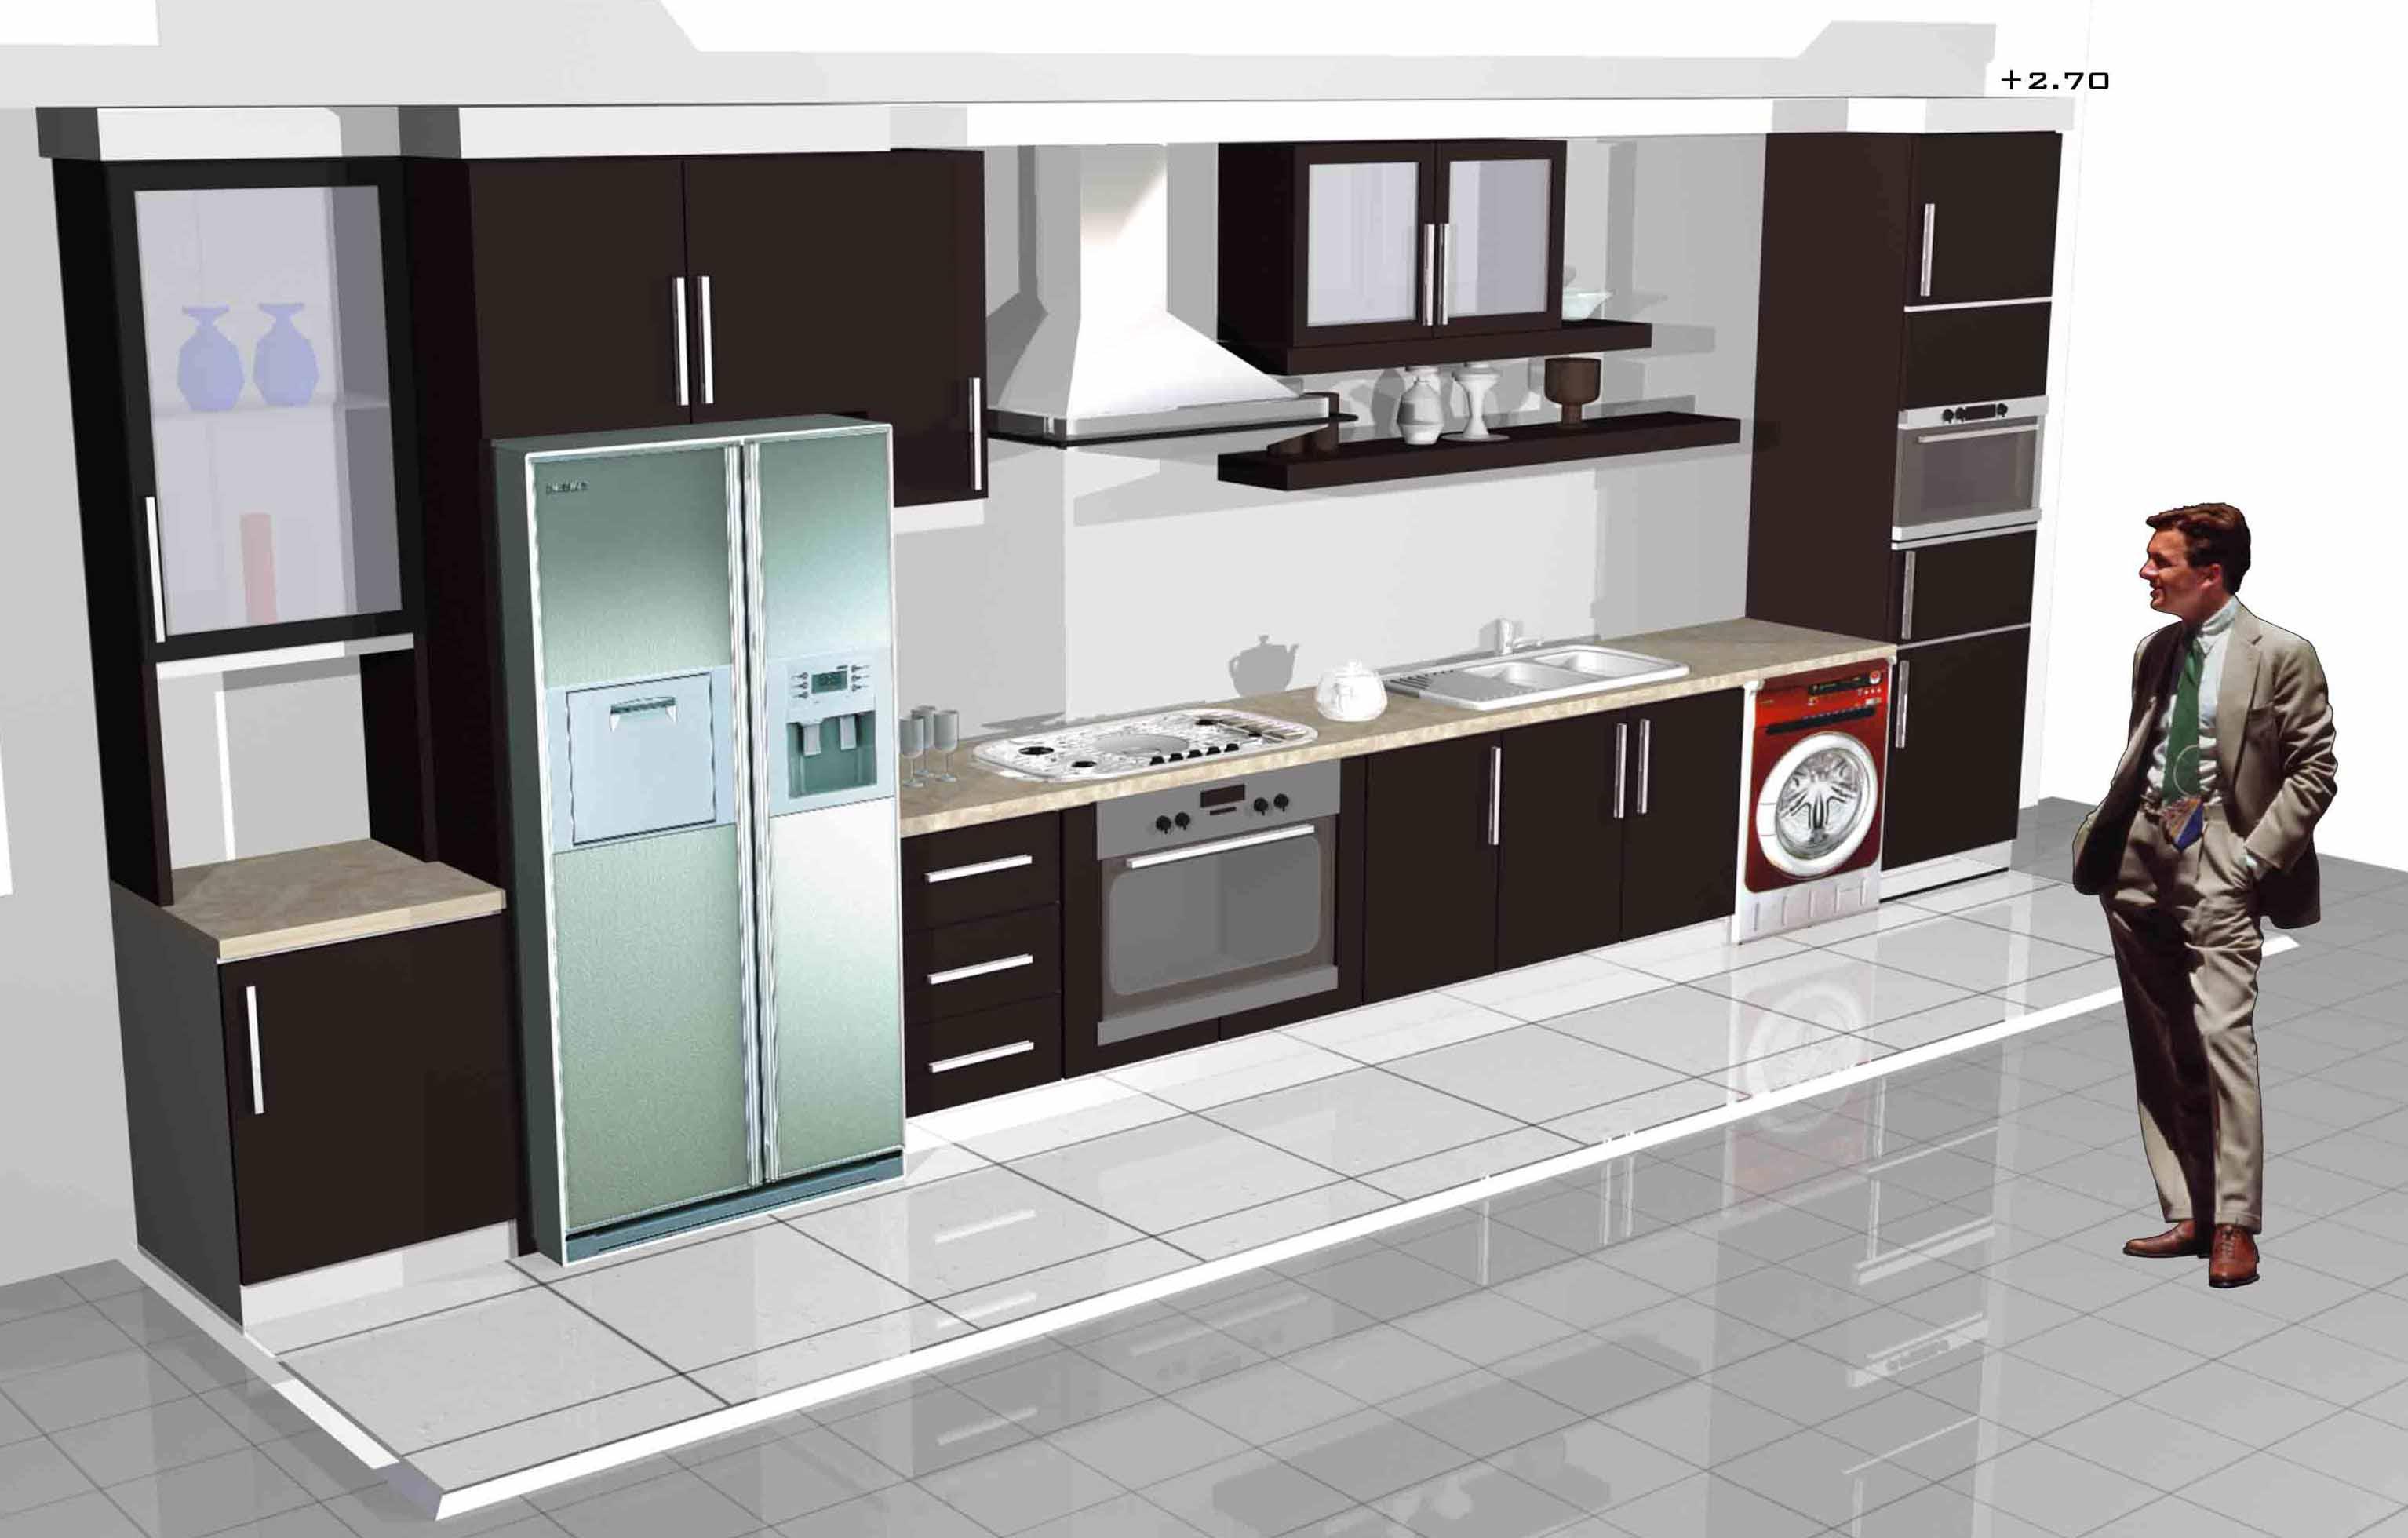 Uncategorized Appliance Stores In Kitchener appliance stores kitchener datalog us kitchener